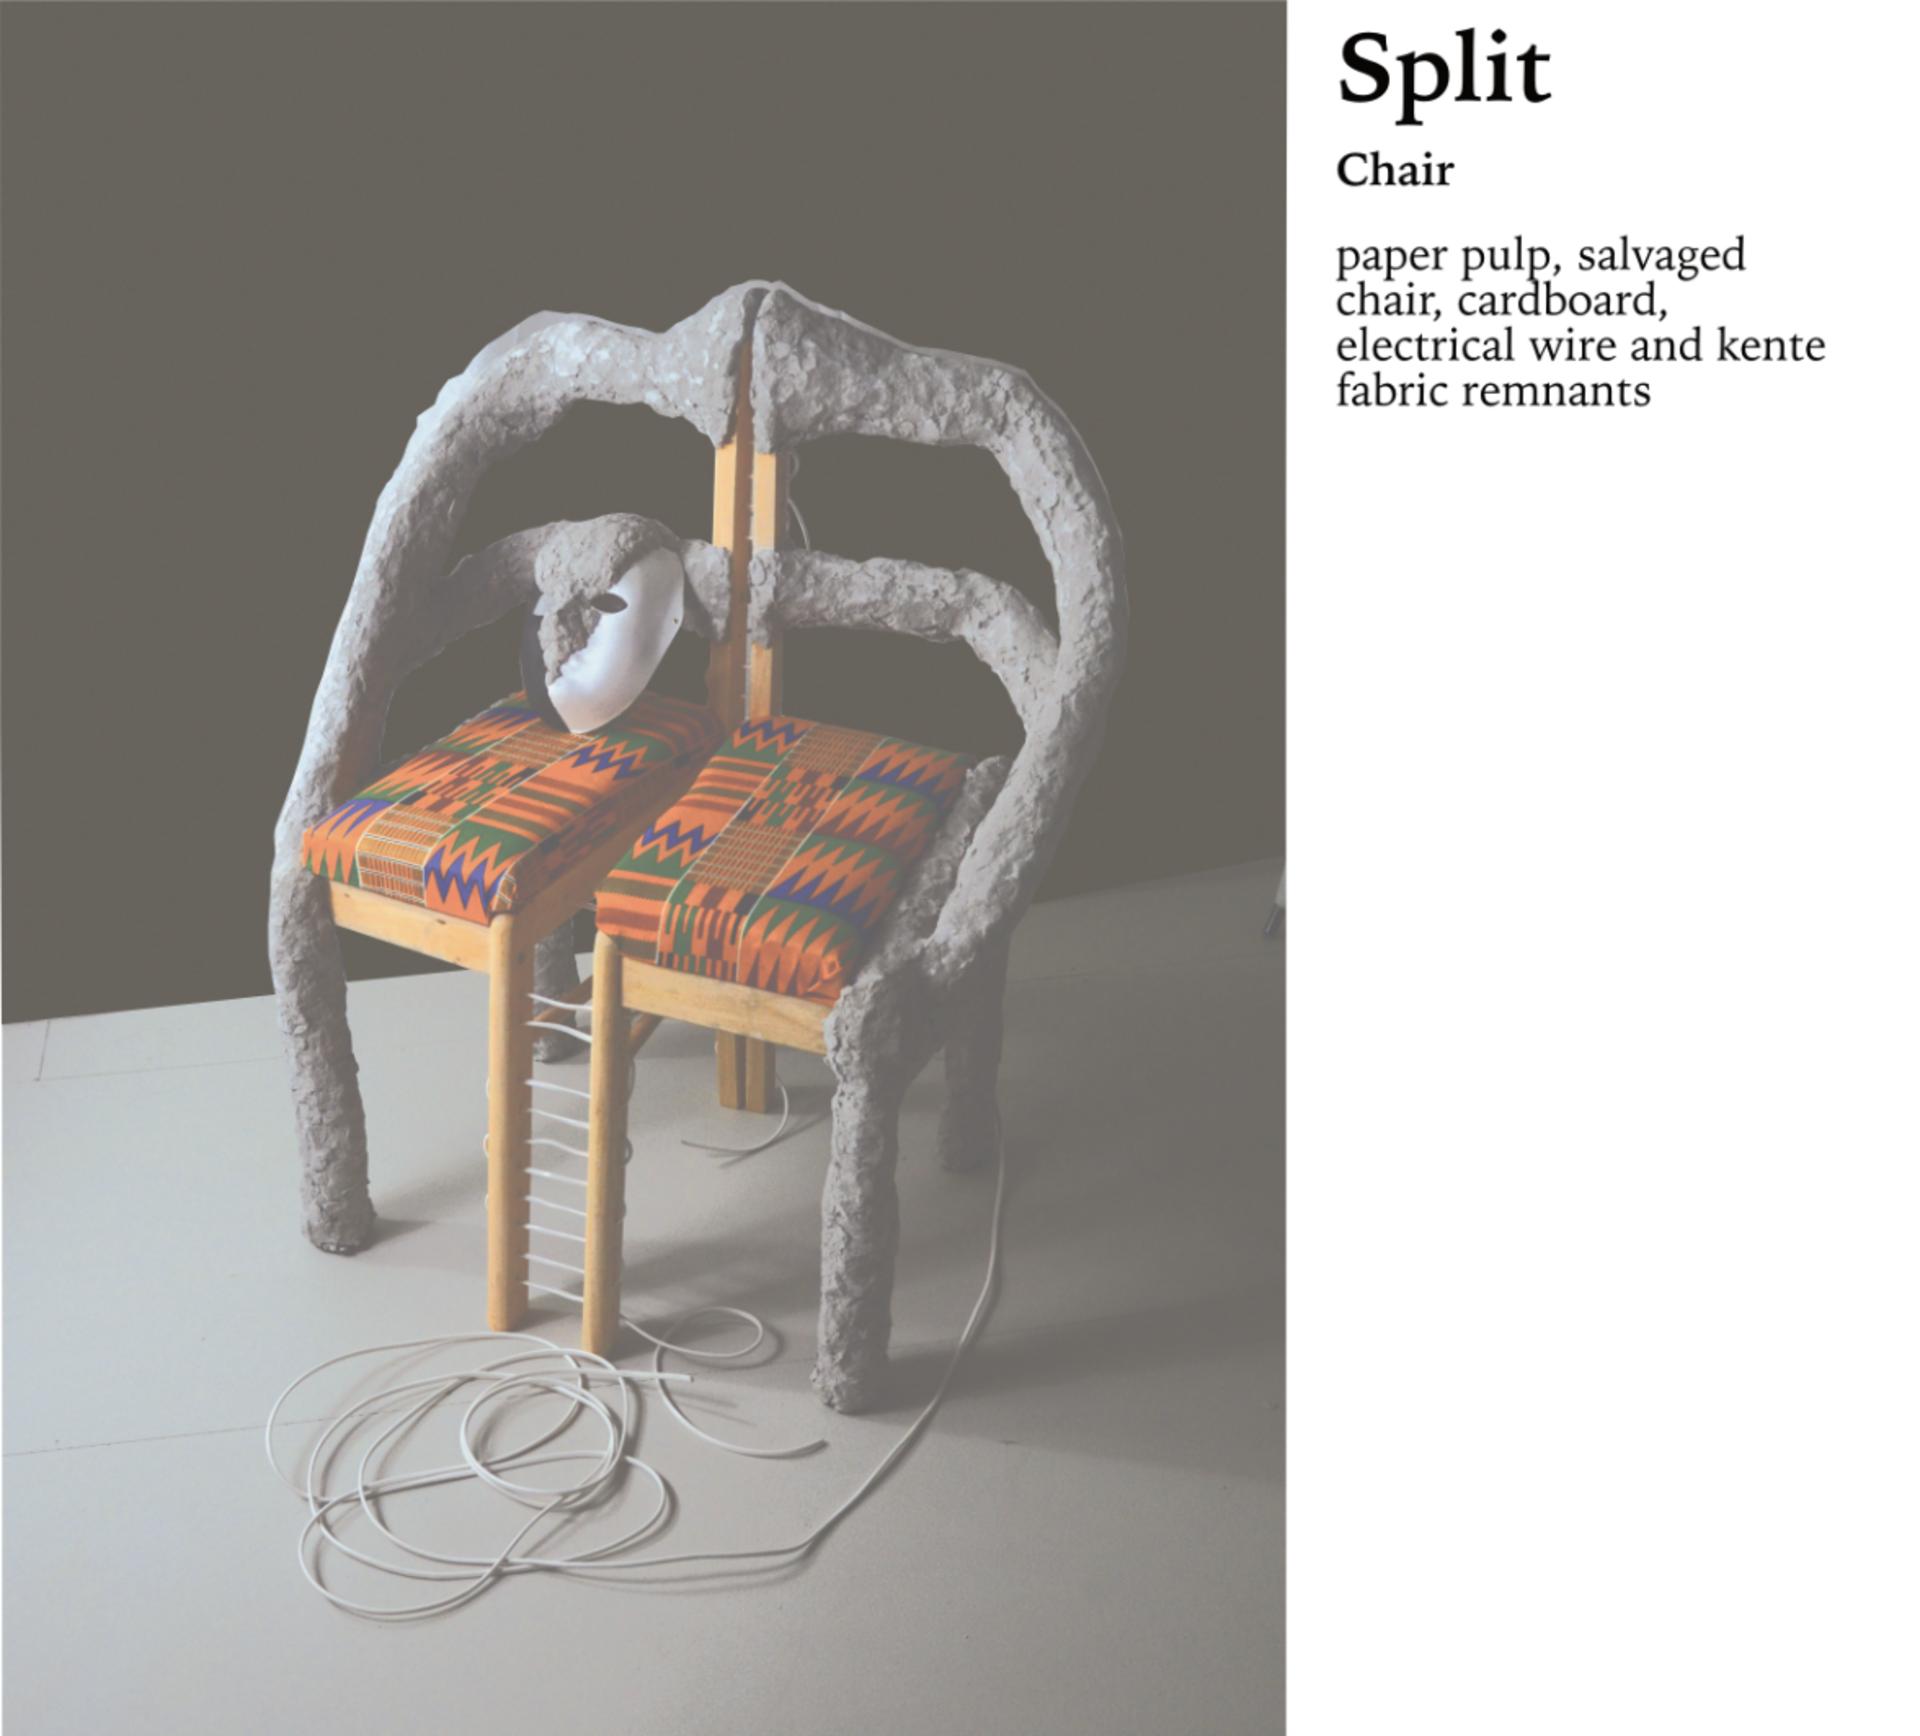 The 'Split' Chair